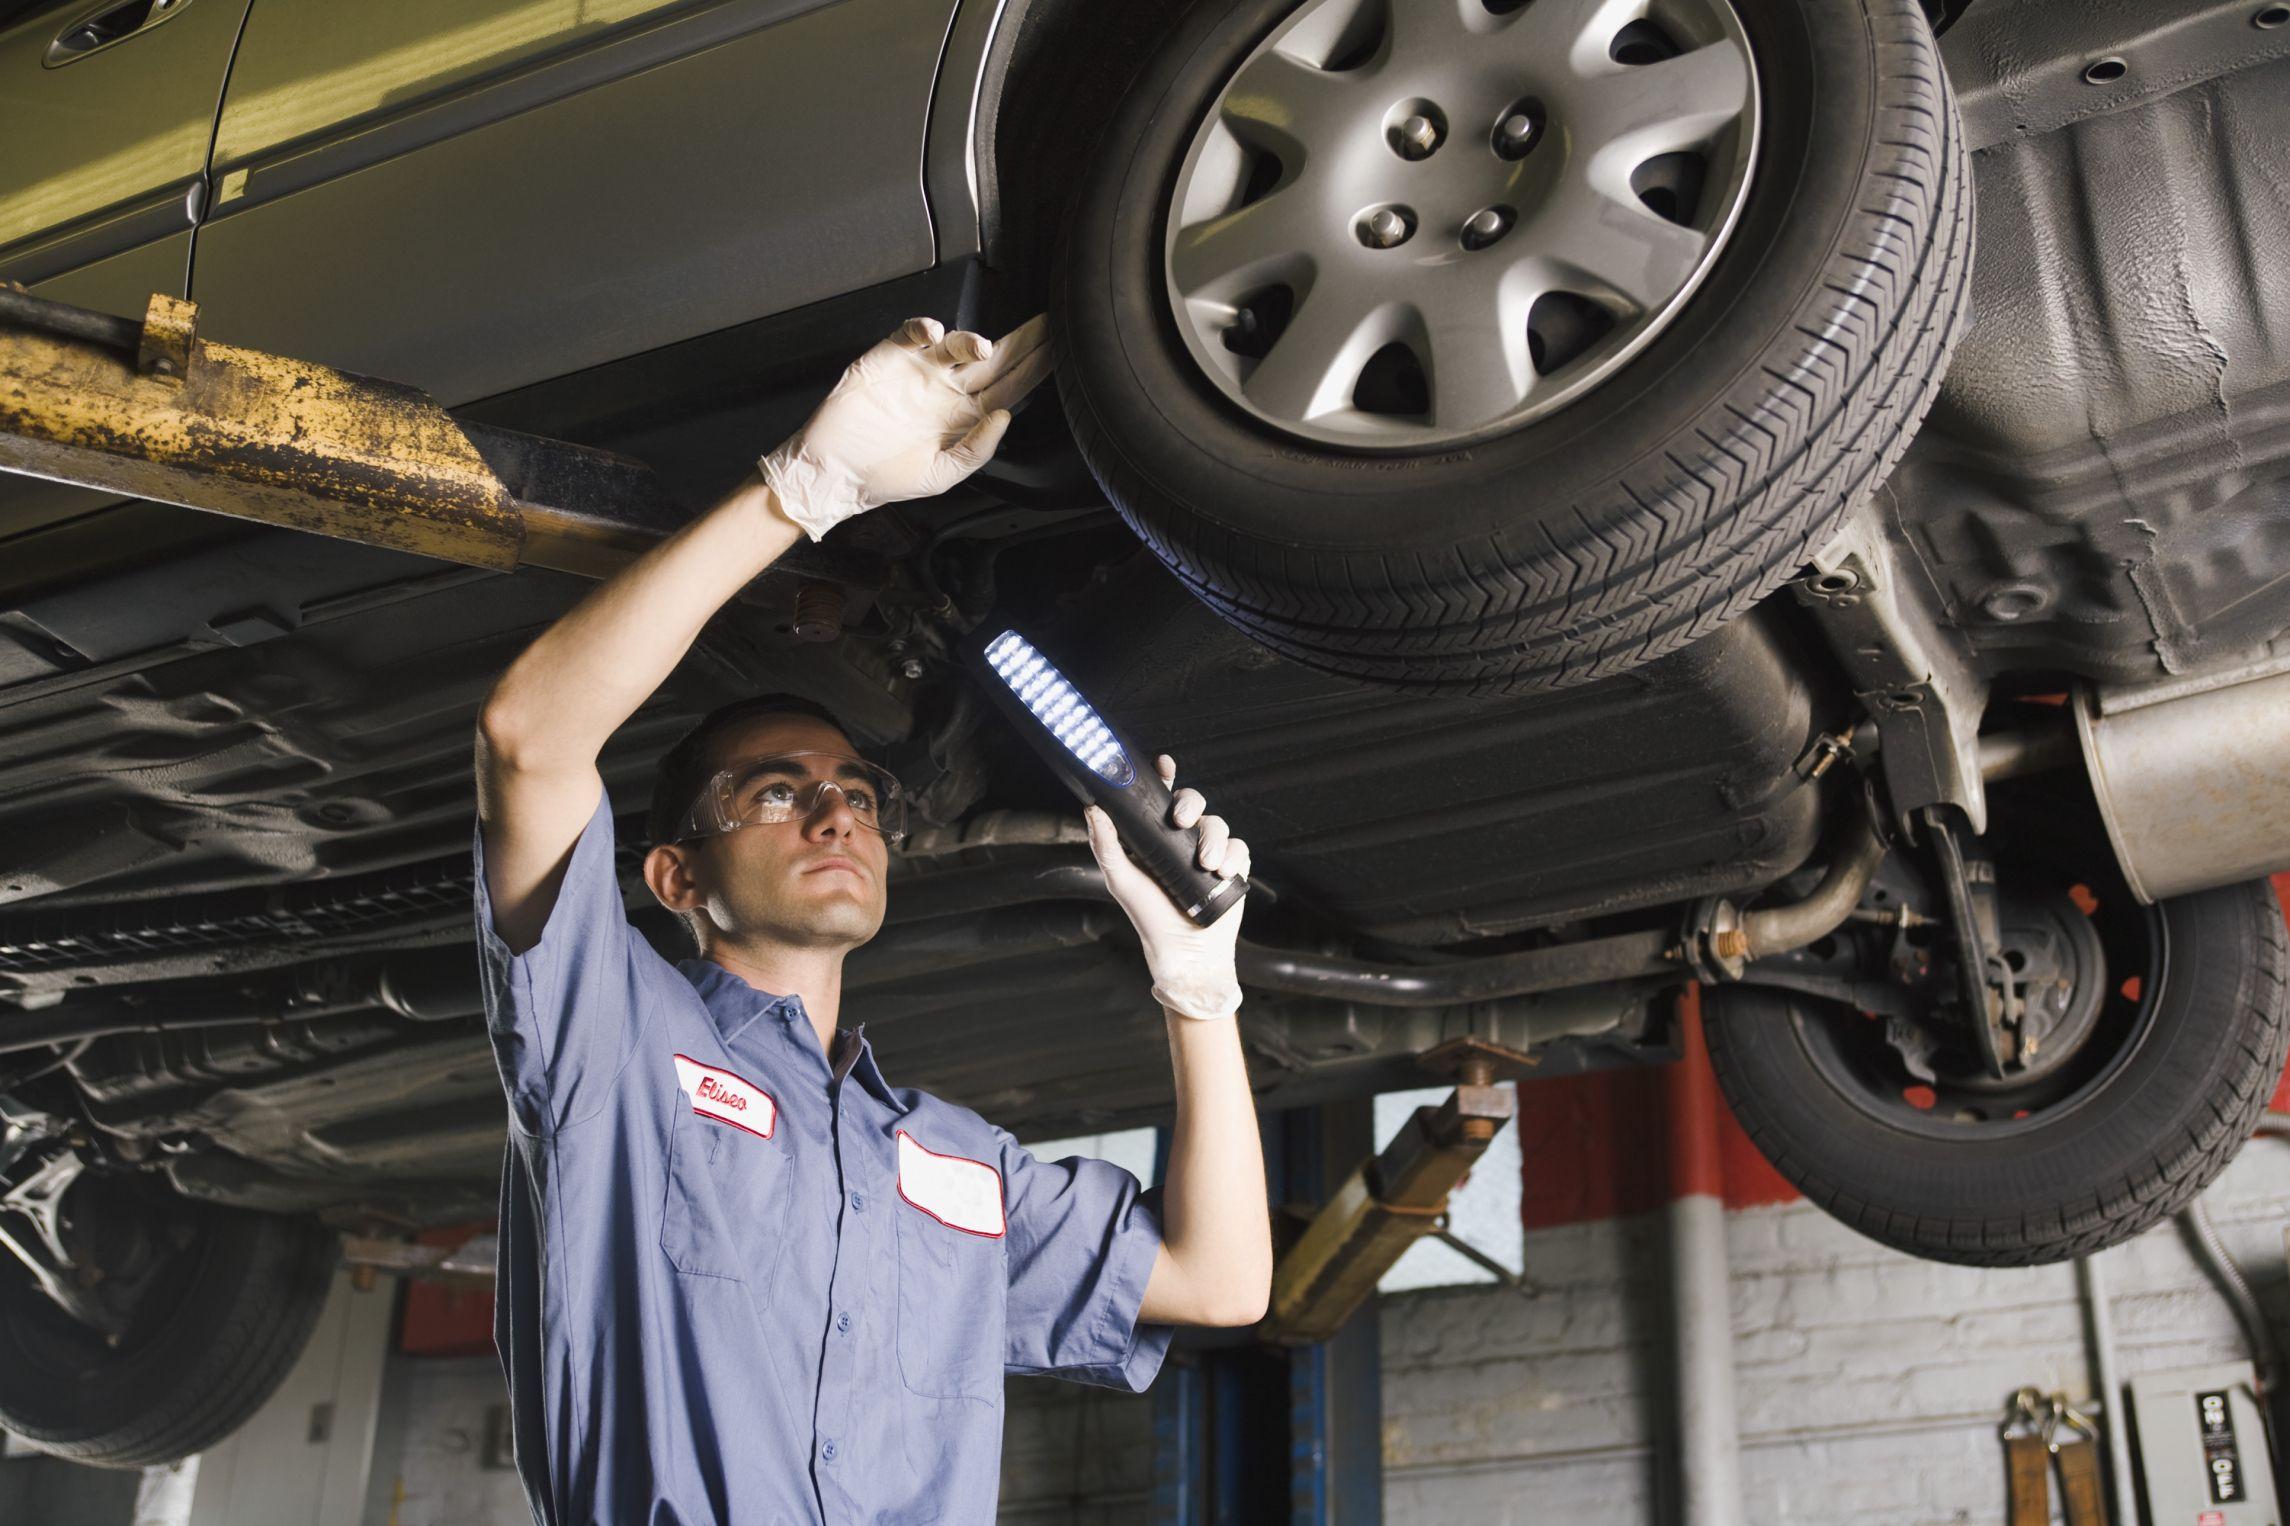 Ati Facut Ultima Revizie Inainte De Venirea Frigului Auto Repair Shop Car Mechanic Auto Repair